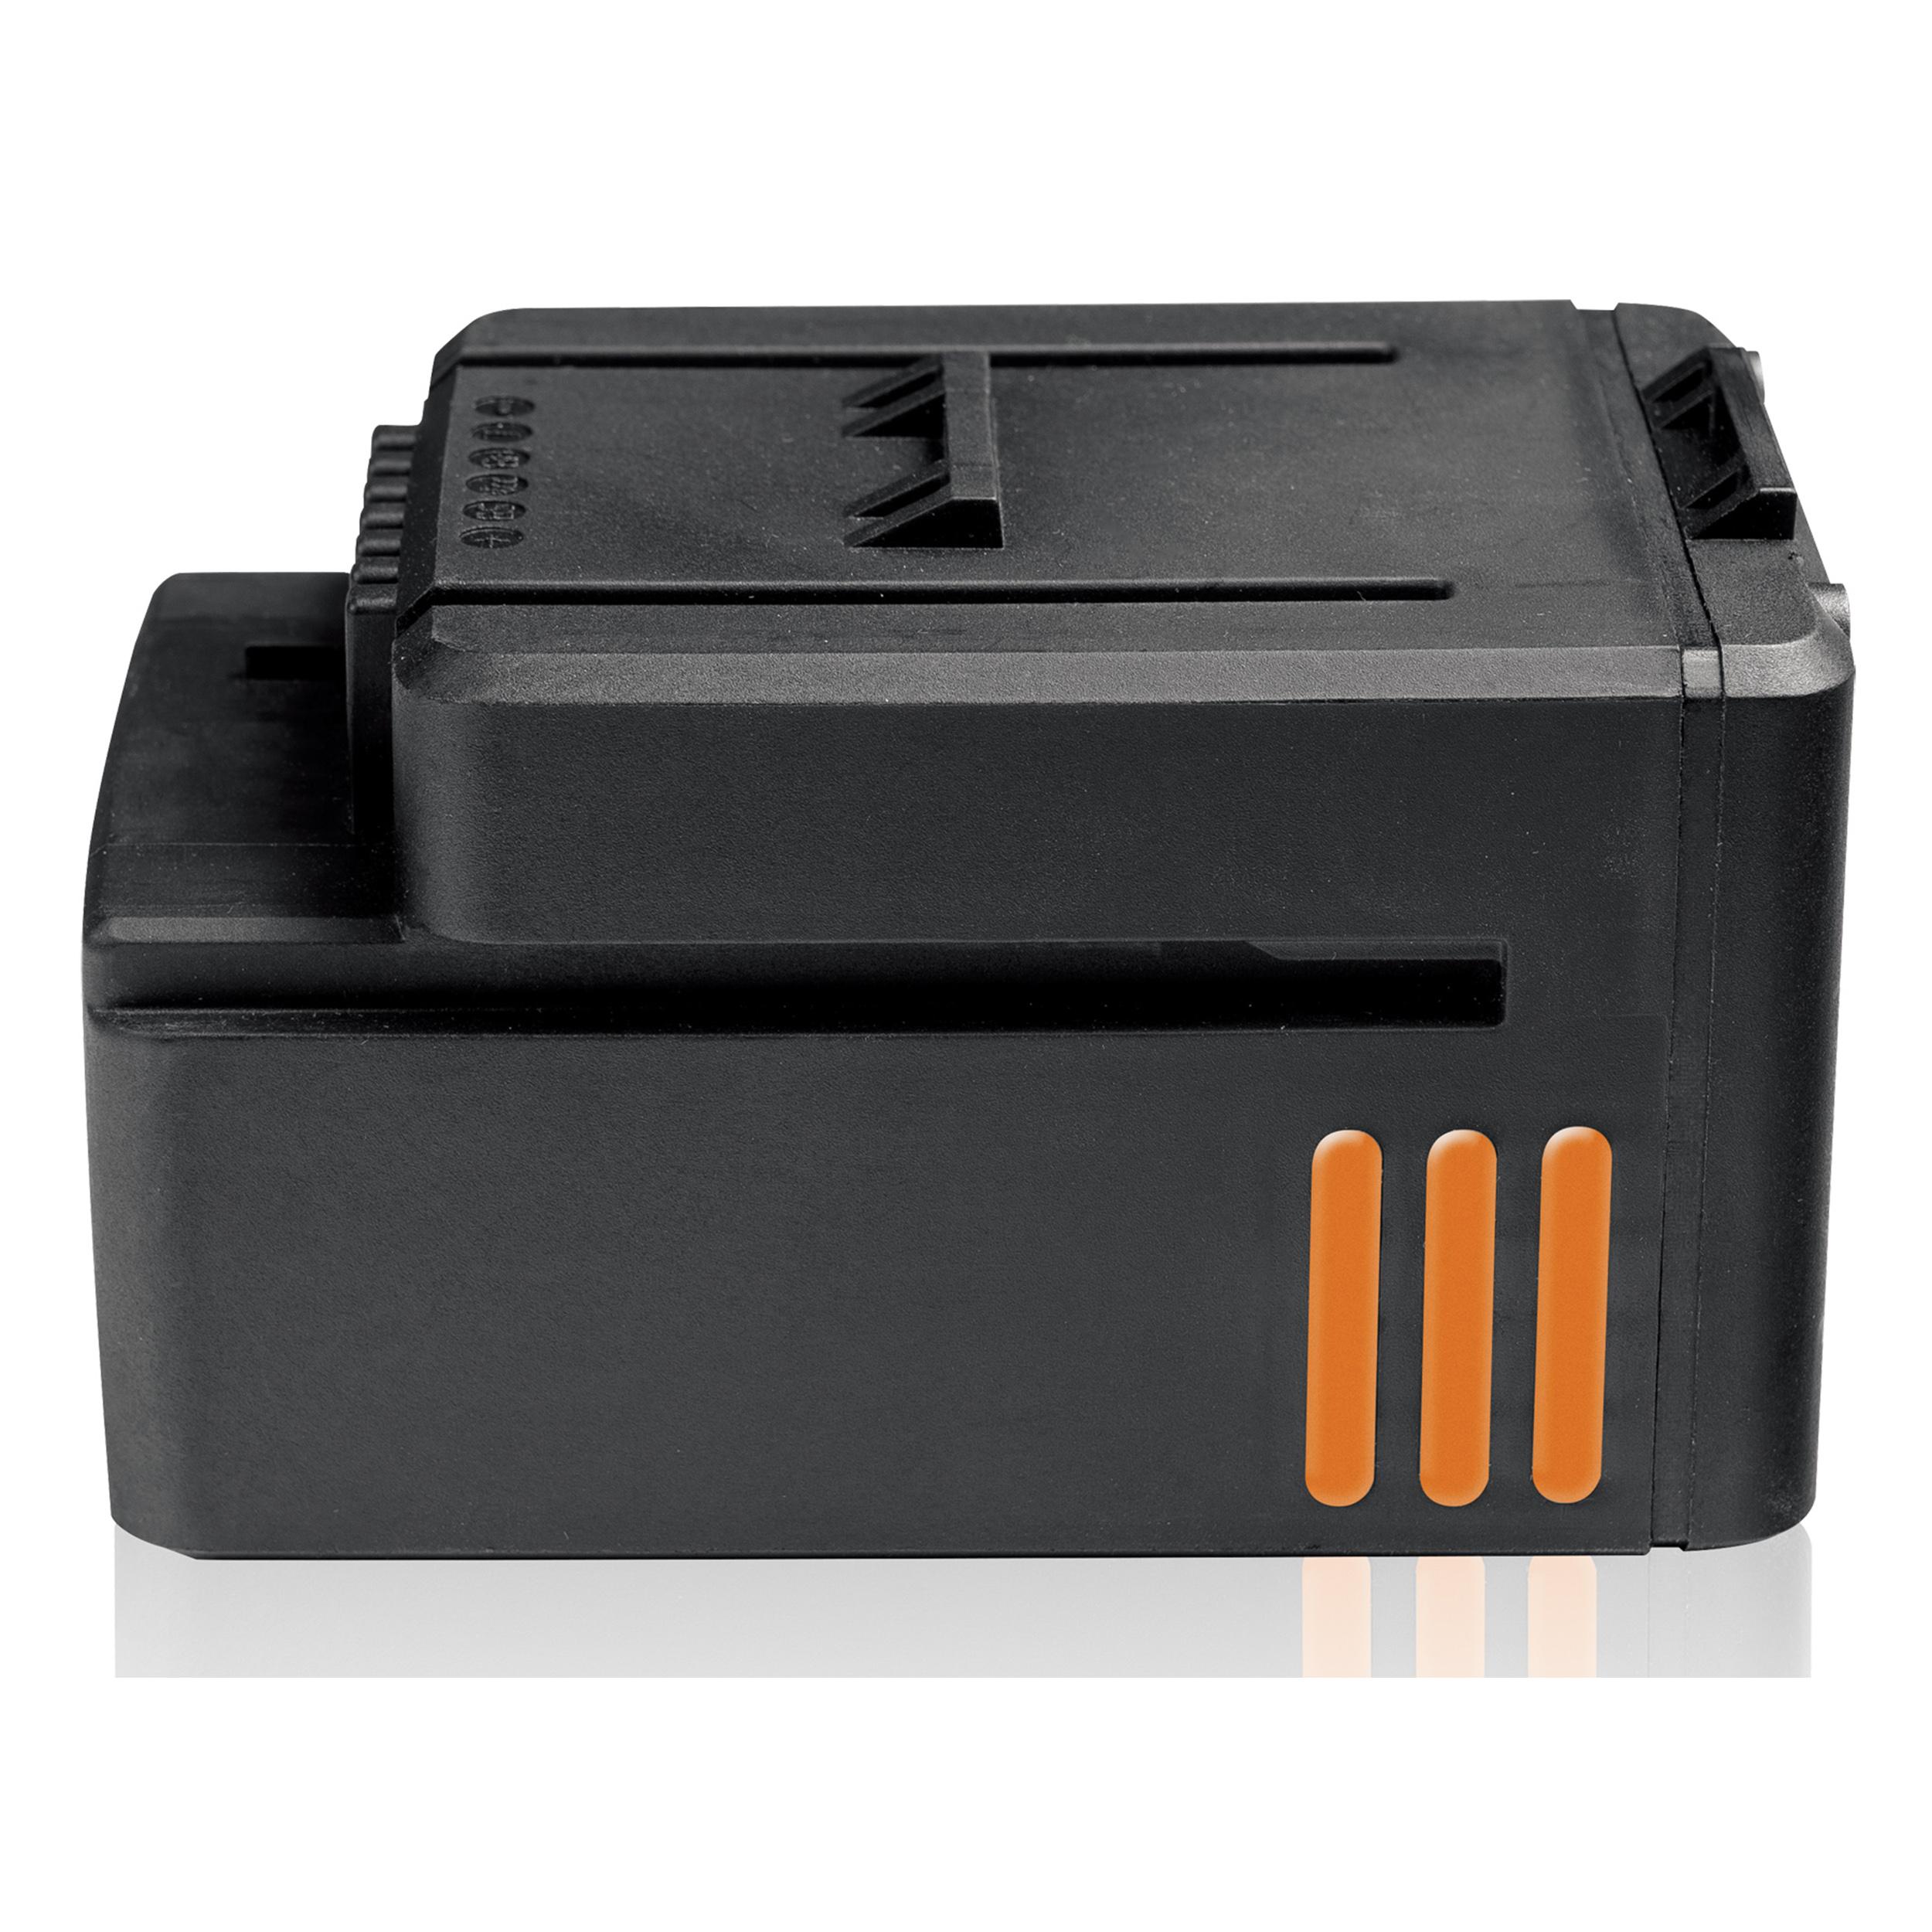 40V MAX Lithium 2.0 Ah Battery for Models WG168, WG268, or WG568